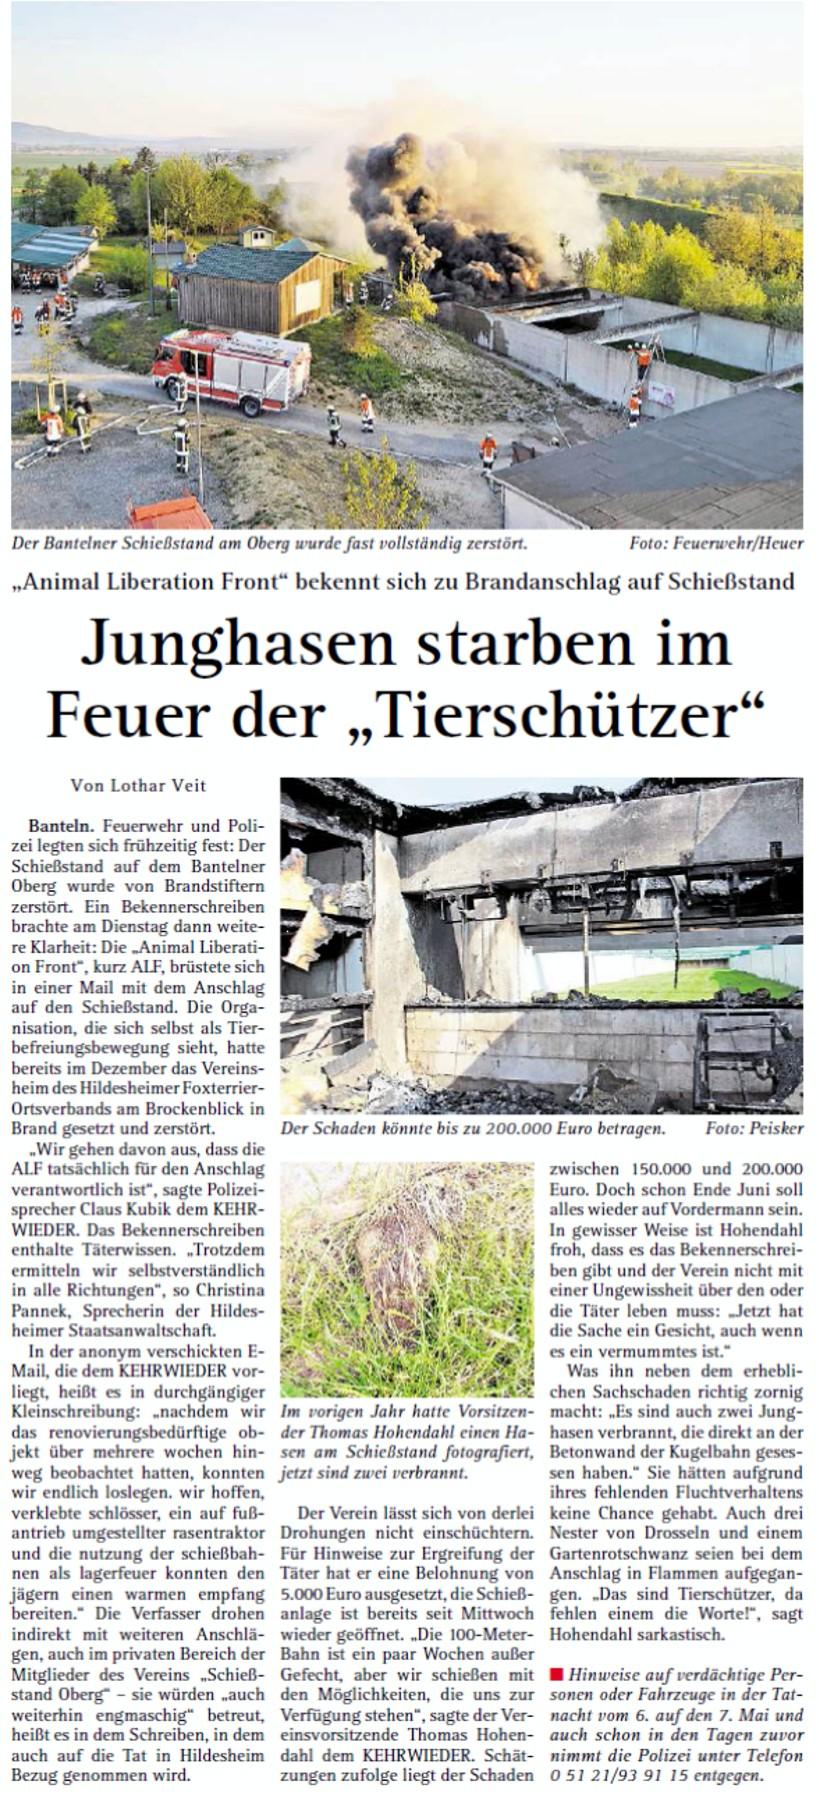 2016-05-15 Kehrwieder